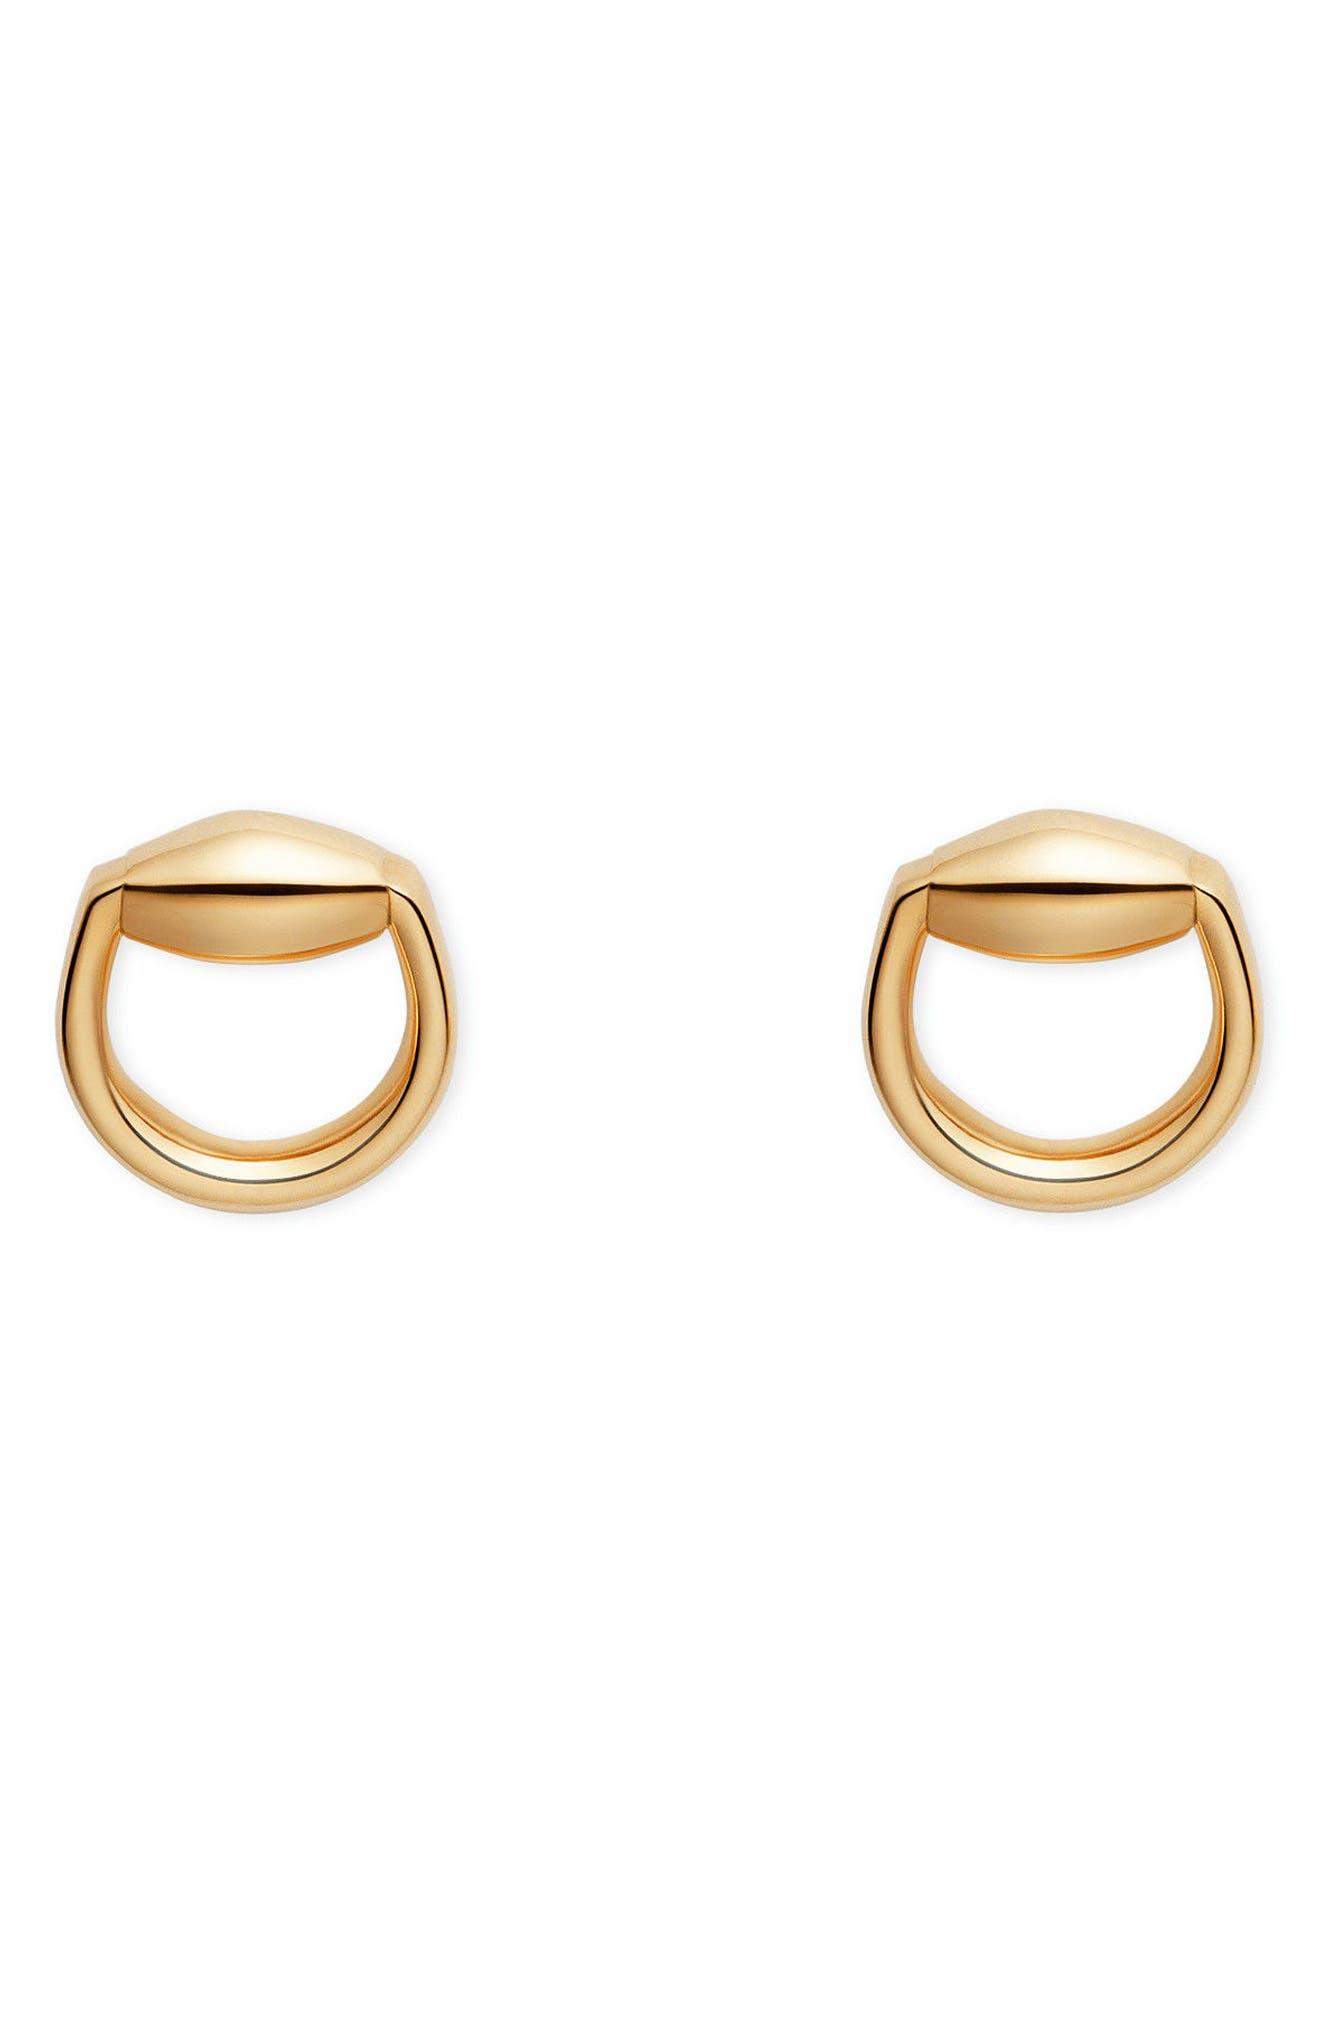 Gucci Horsebit Stud Earrings